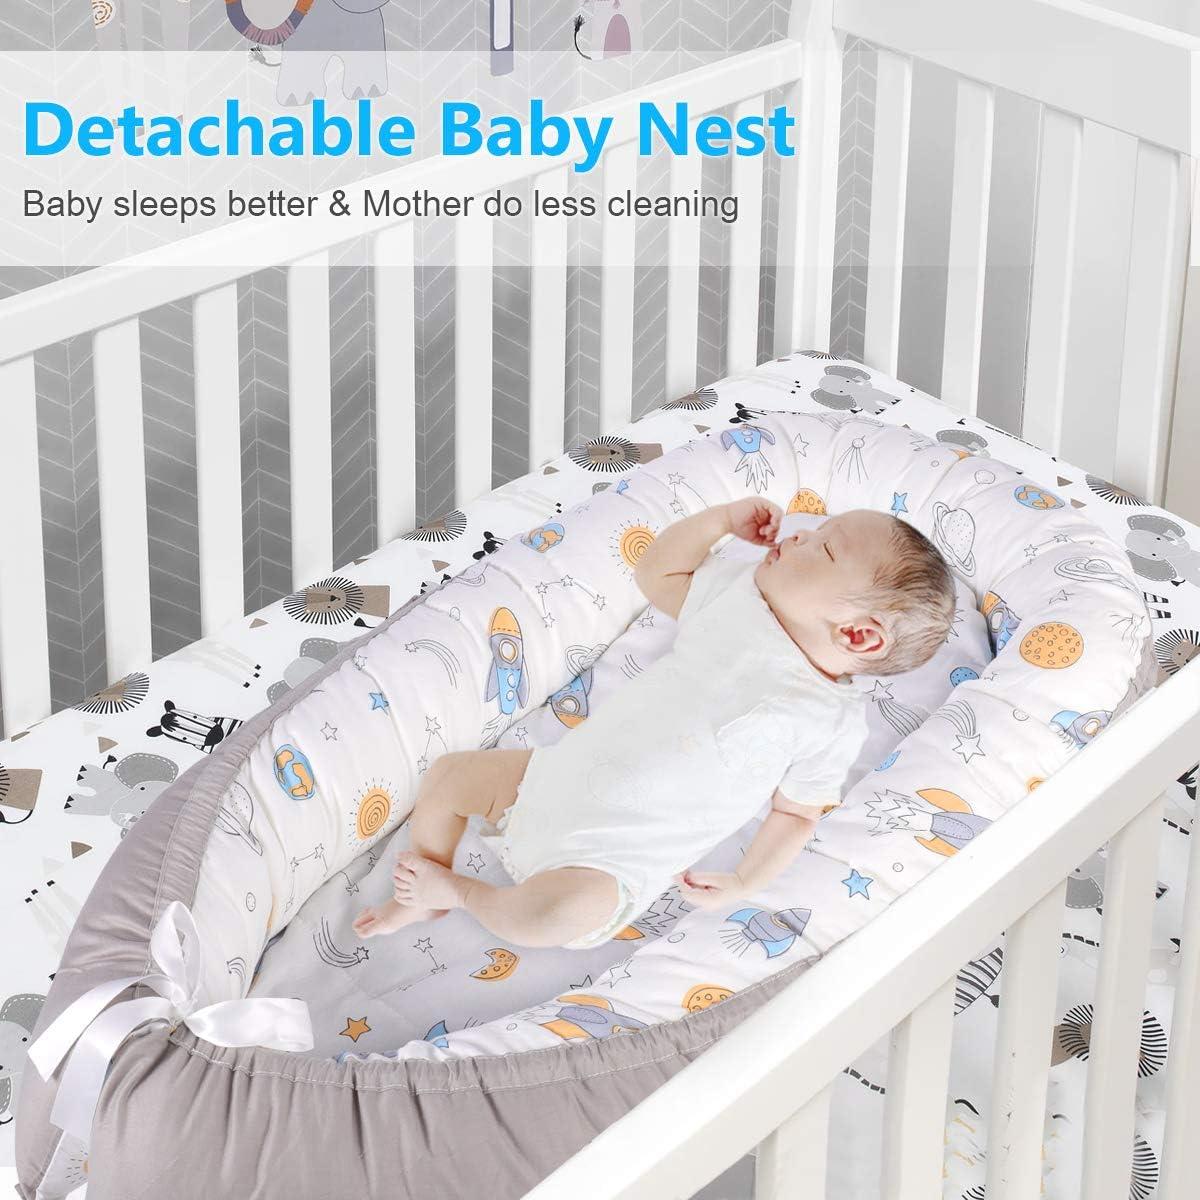 uso desmontable en cuna para reci/én nacido Animales coloridos transpirable suave cuna port/átil con colch/ón de seda helada Baby Nest Pod